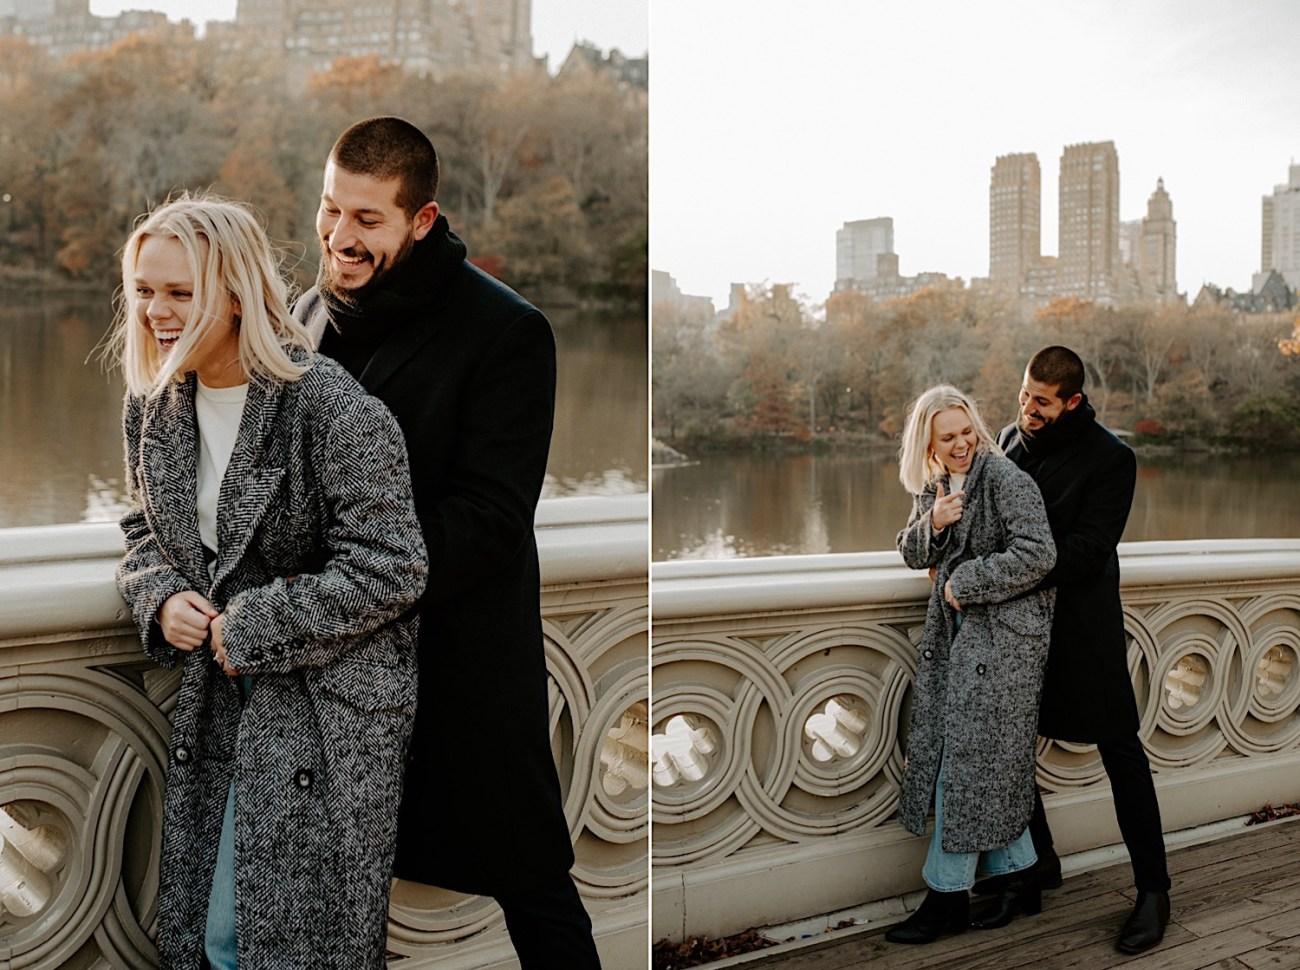 Central Park Engagement Photos Manhattan Engagement NYC Wedding Photographer 10